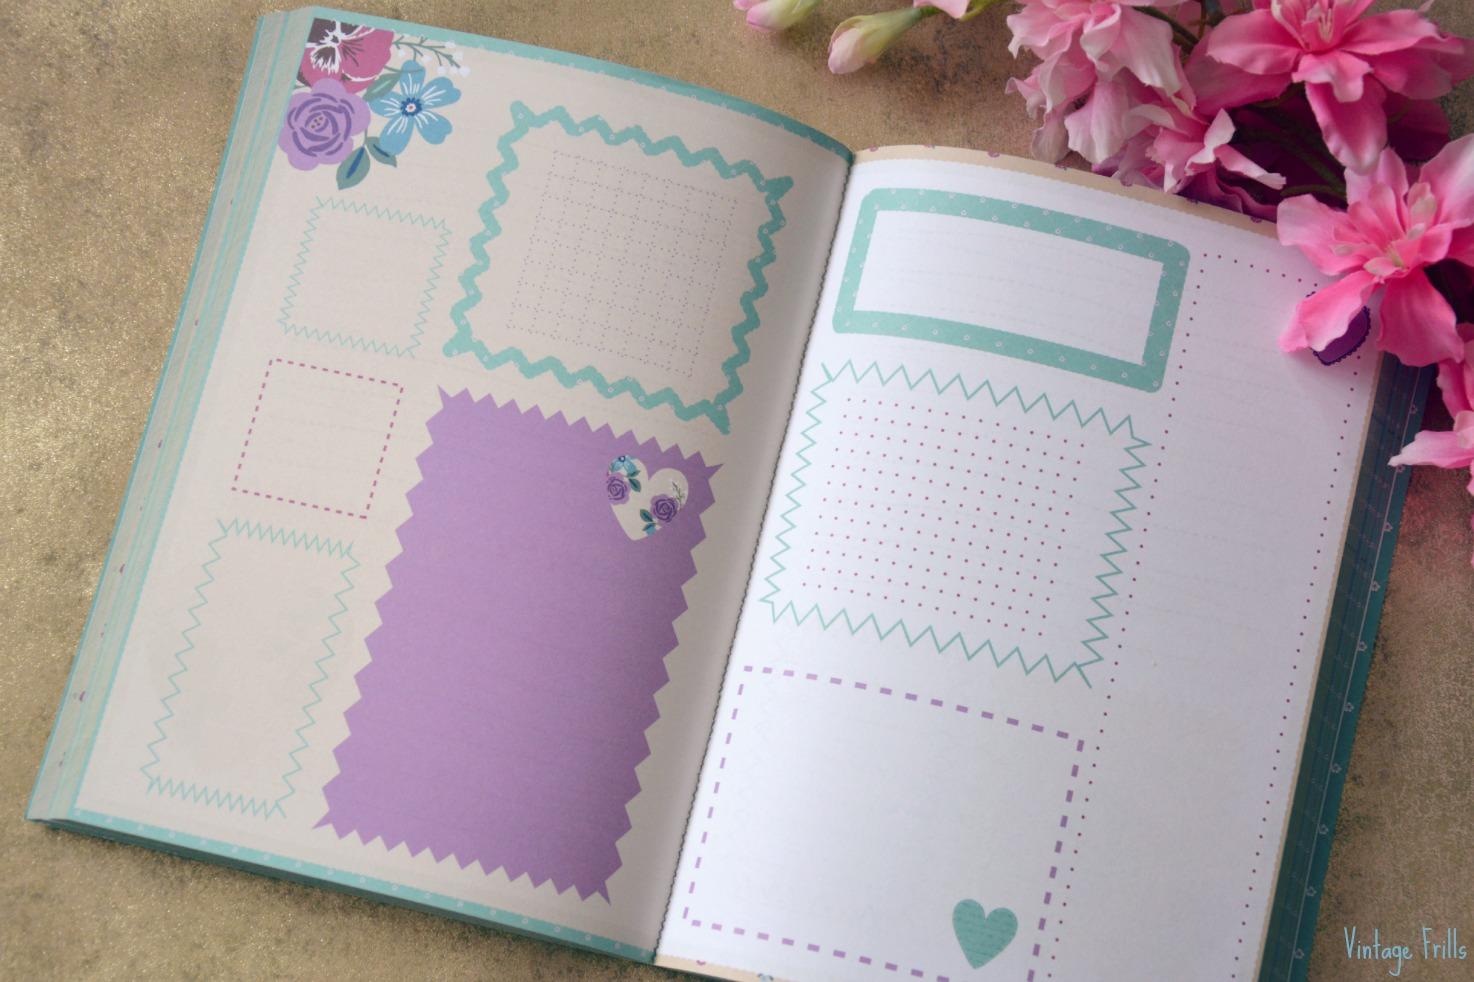 Wilkos Notebook